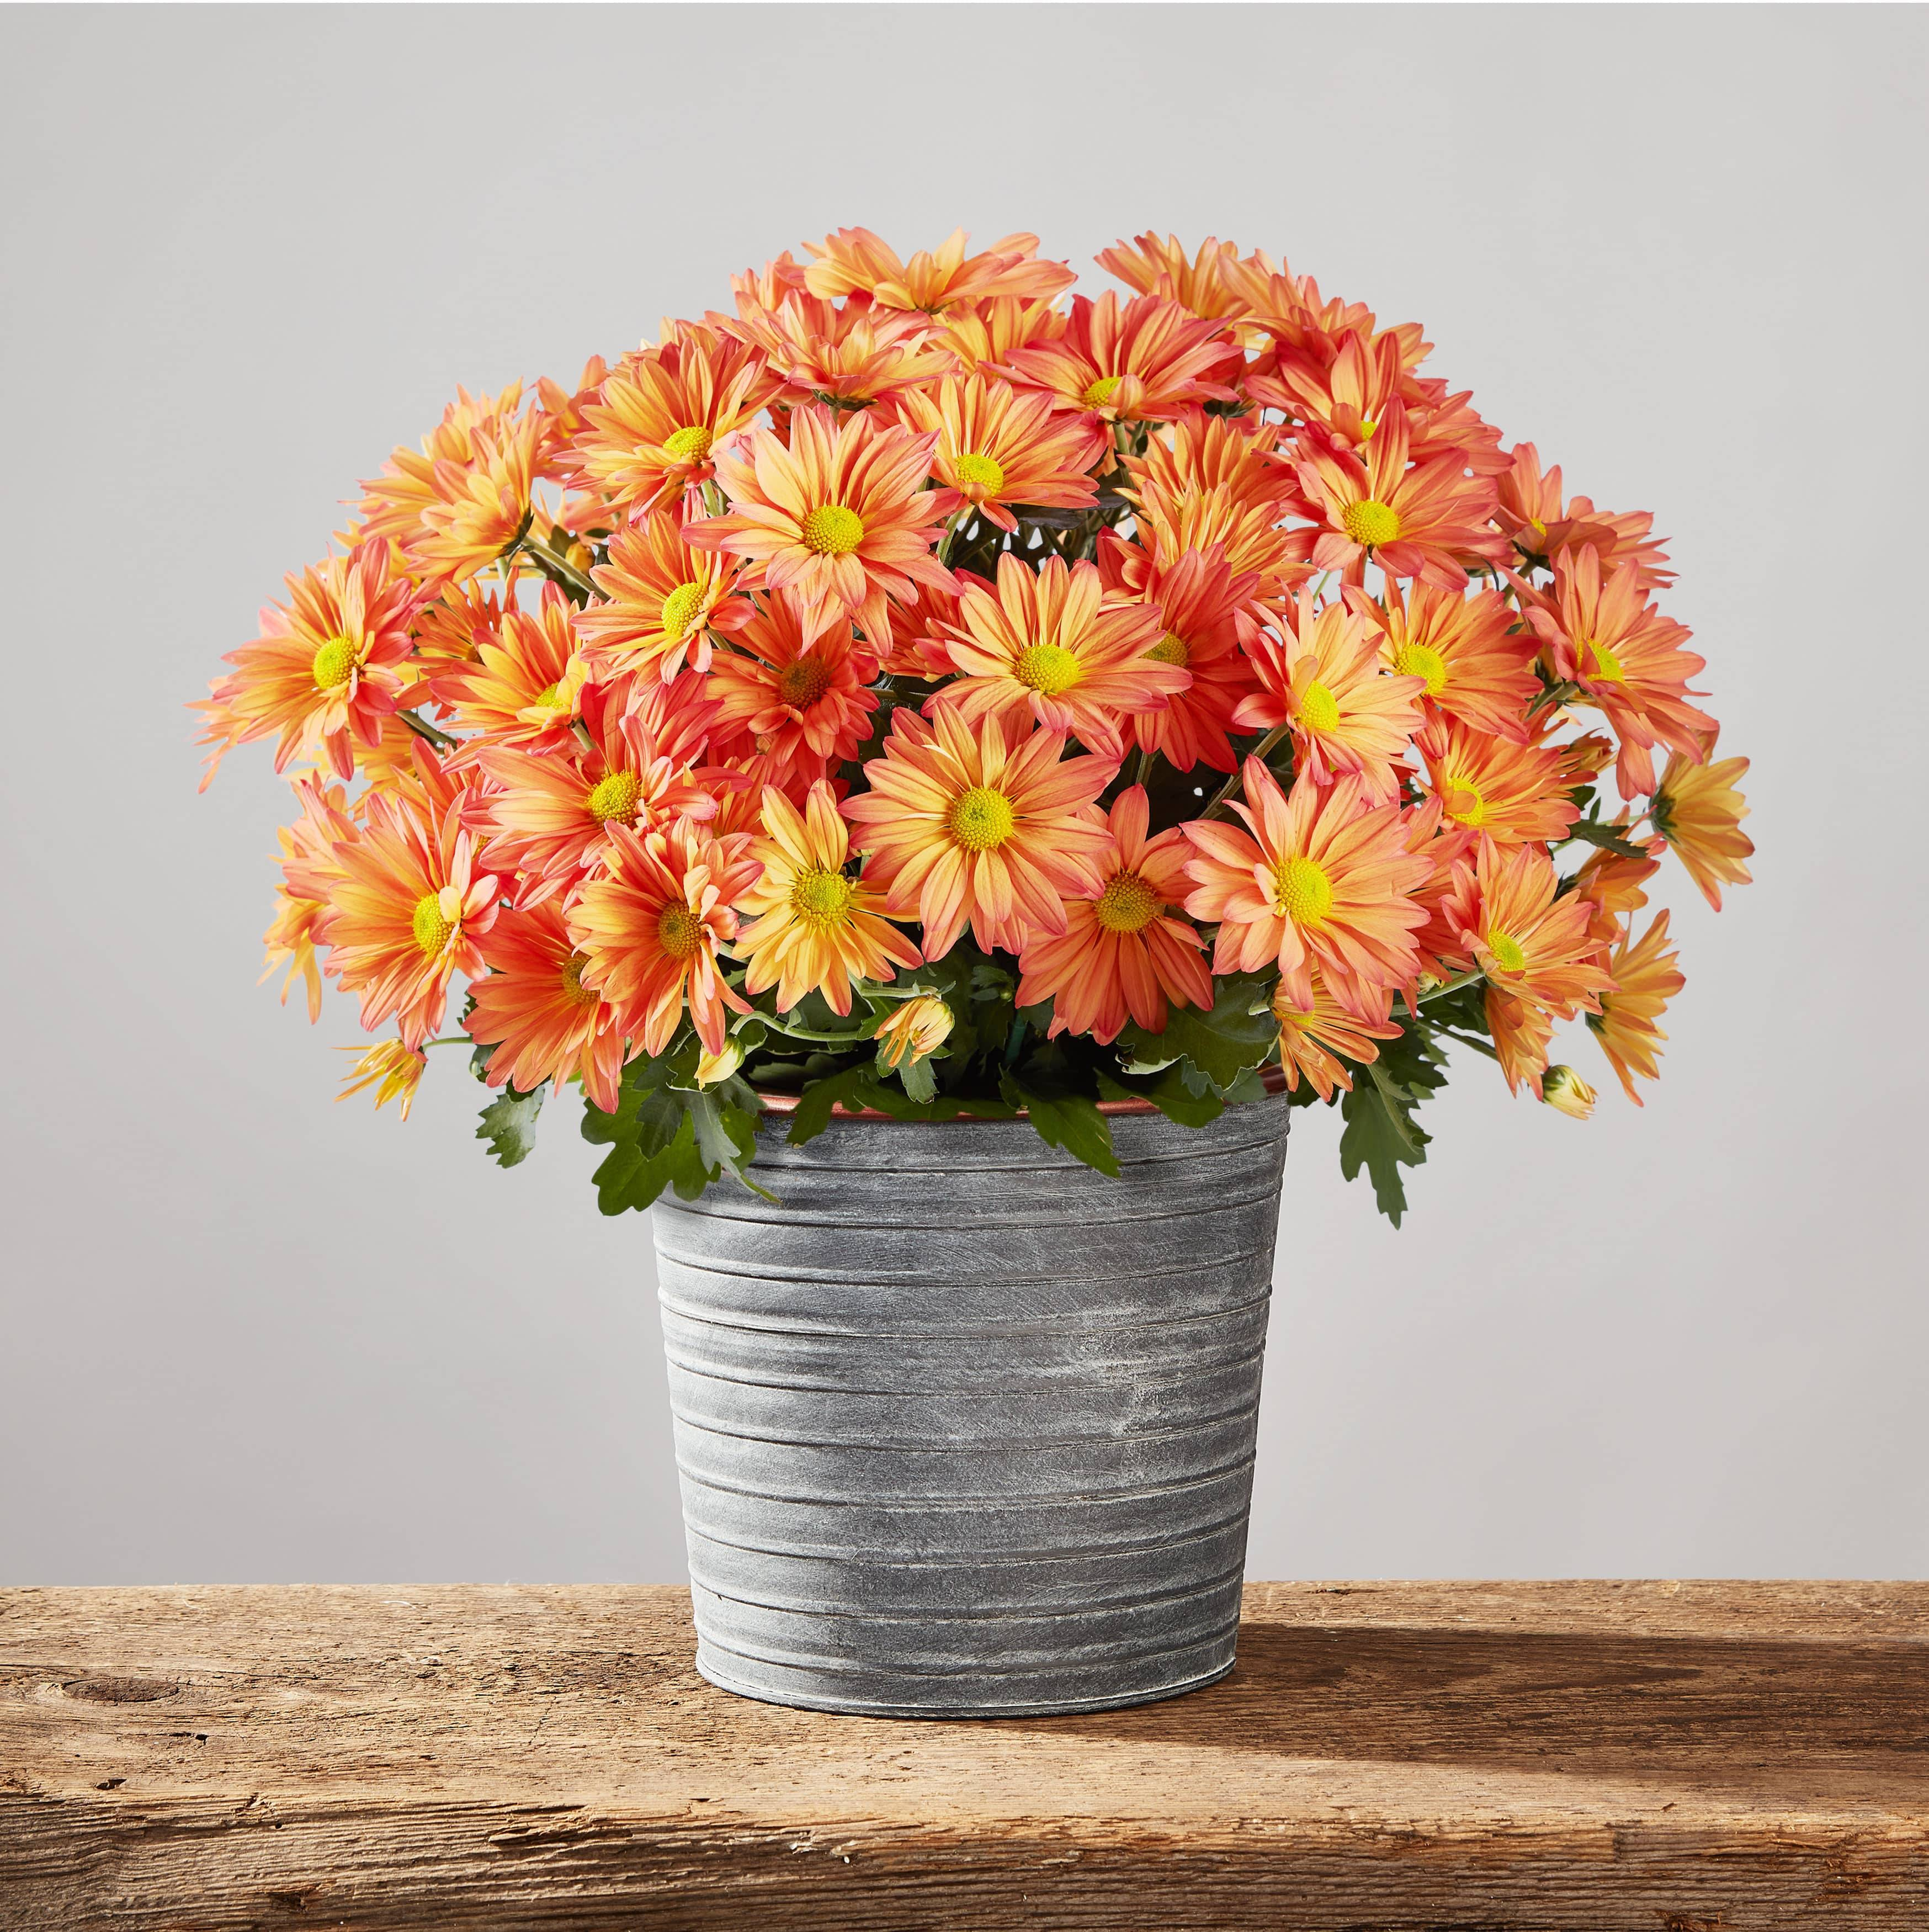 Fall Mum (Chrysanthemum)